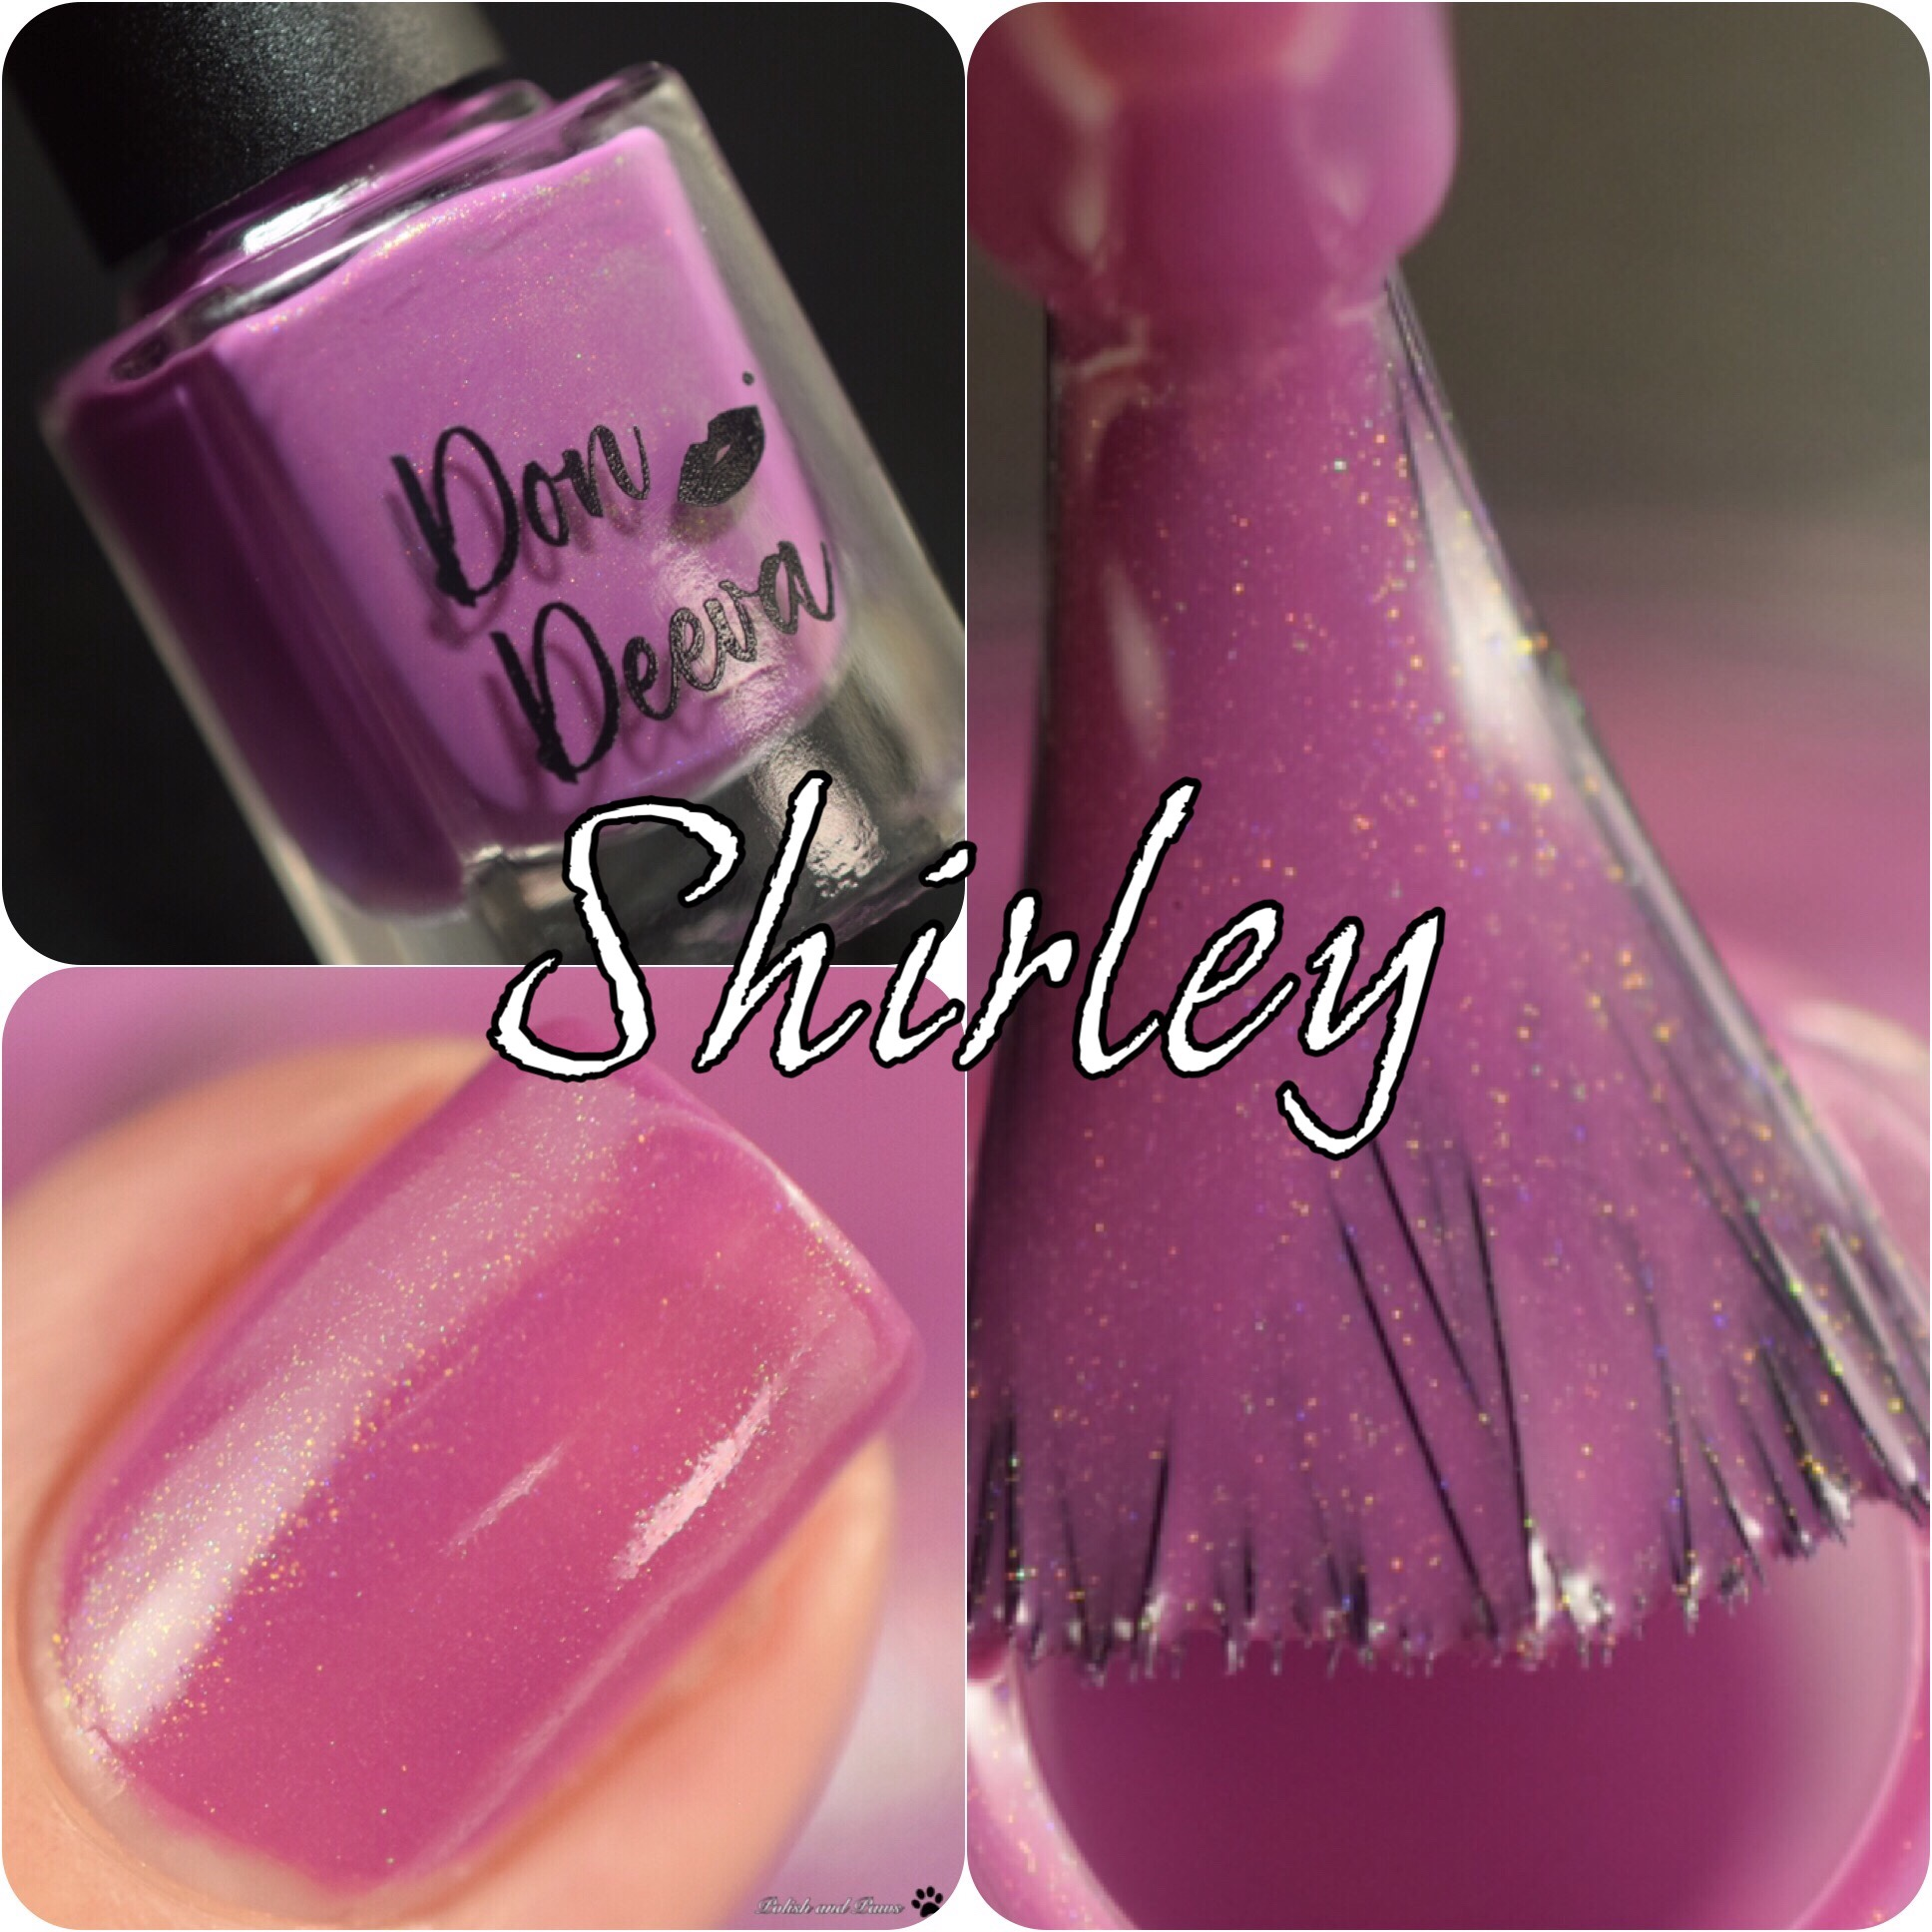 Don Deeva Shirley